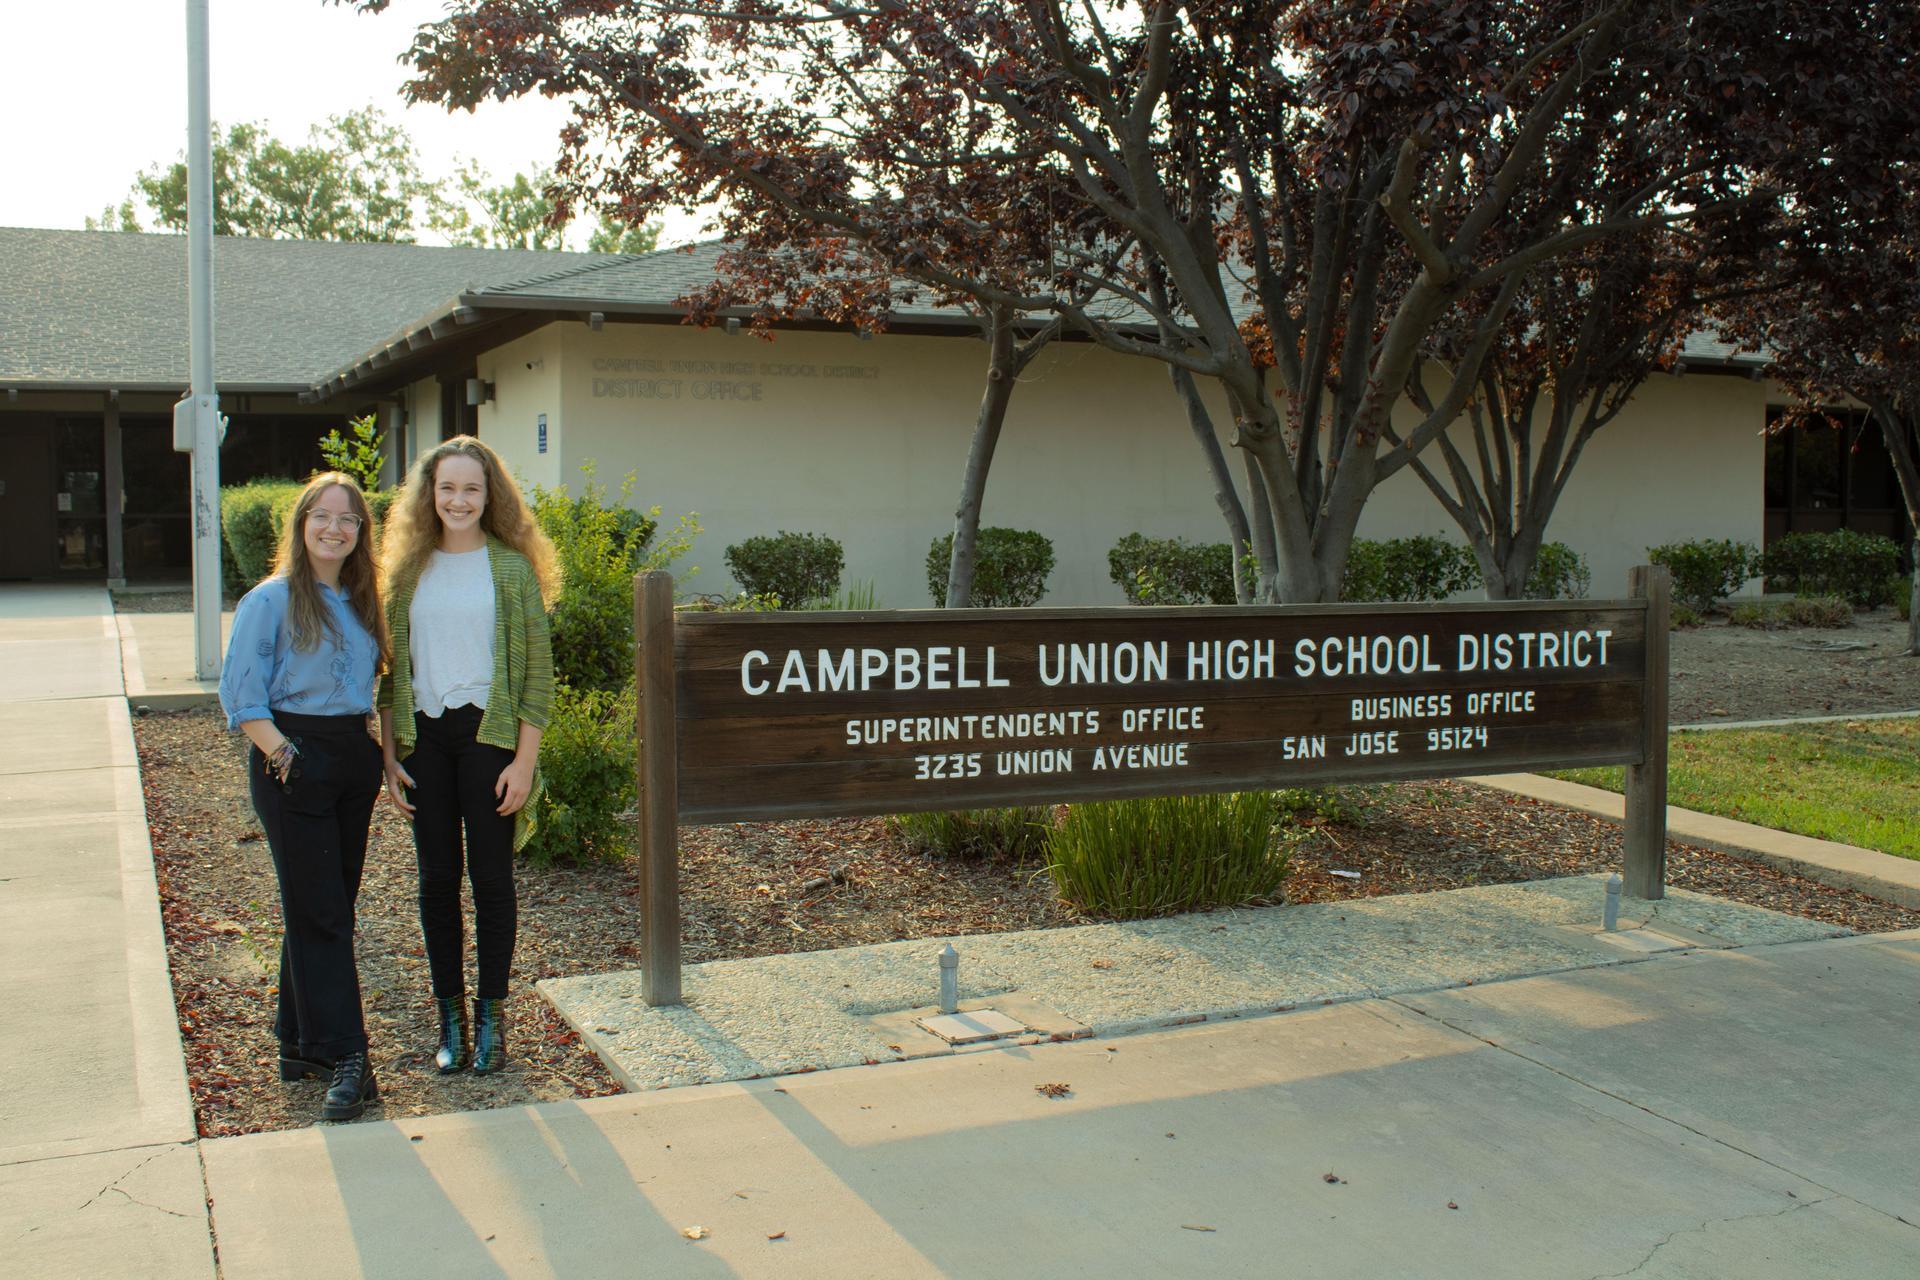 Alison Lubiens and Ainsley Bateman, Student Board Representatives